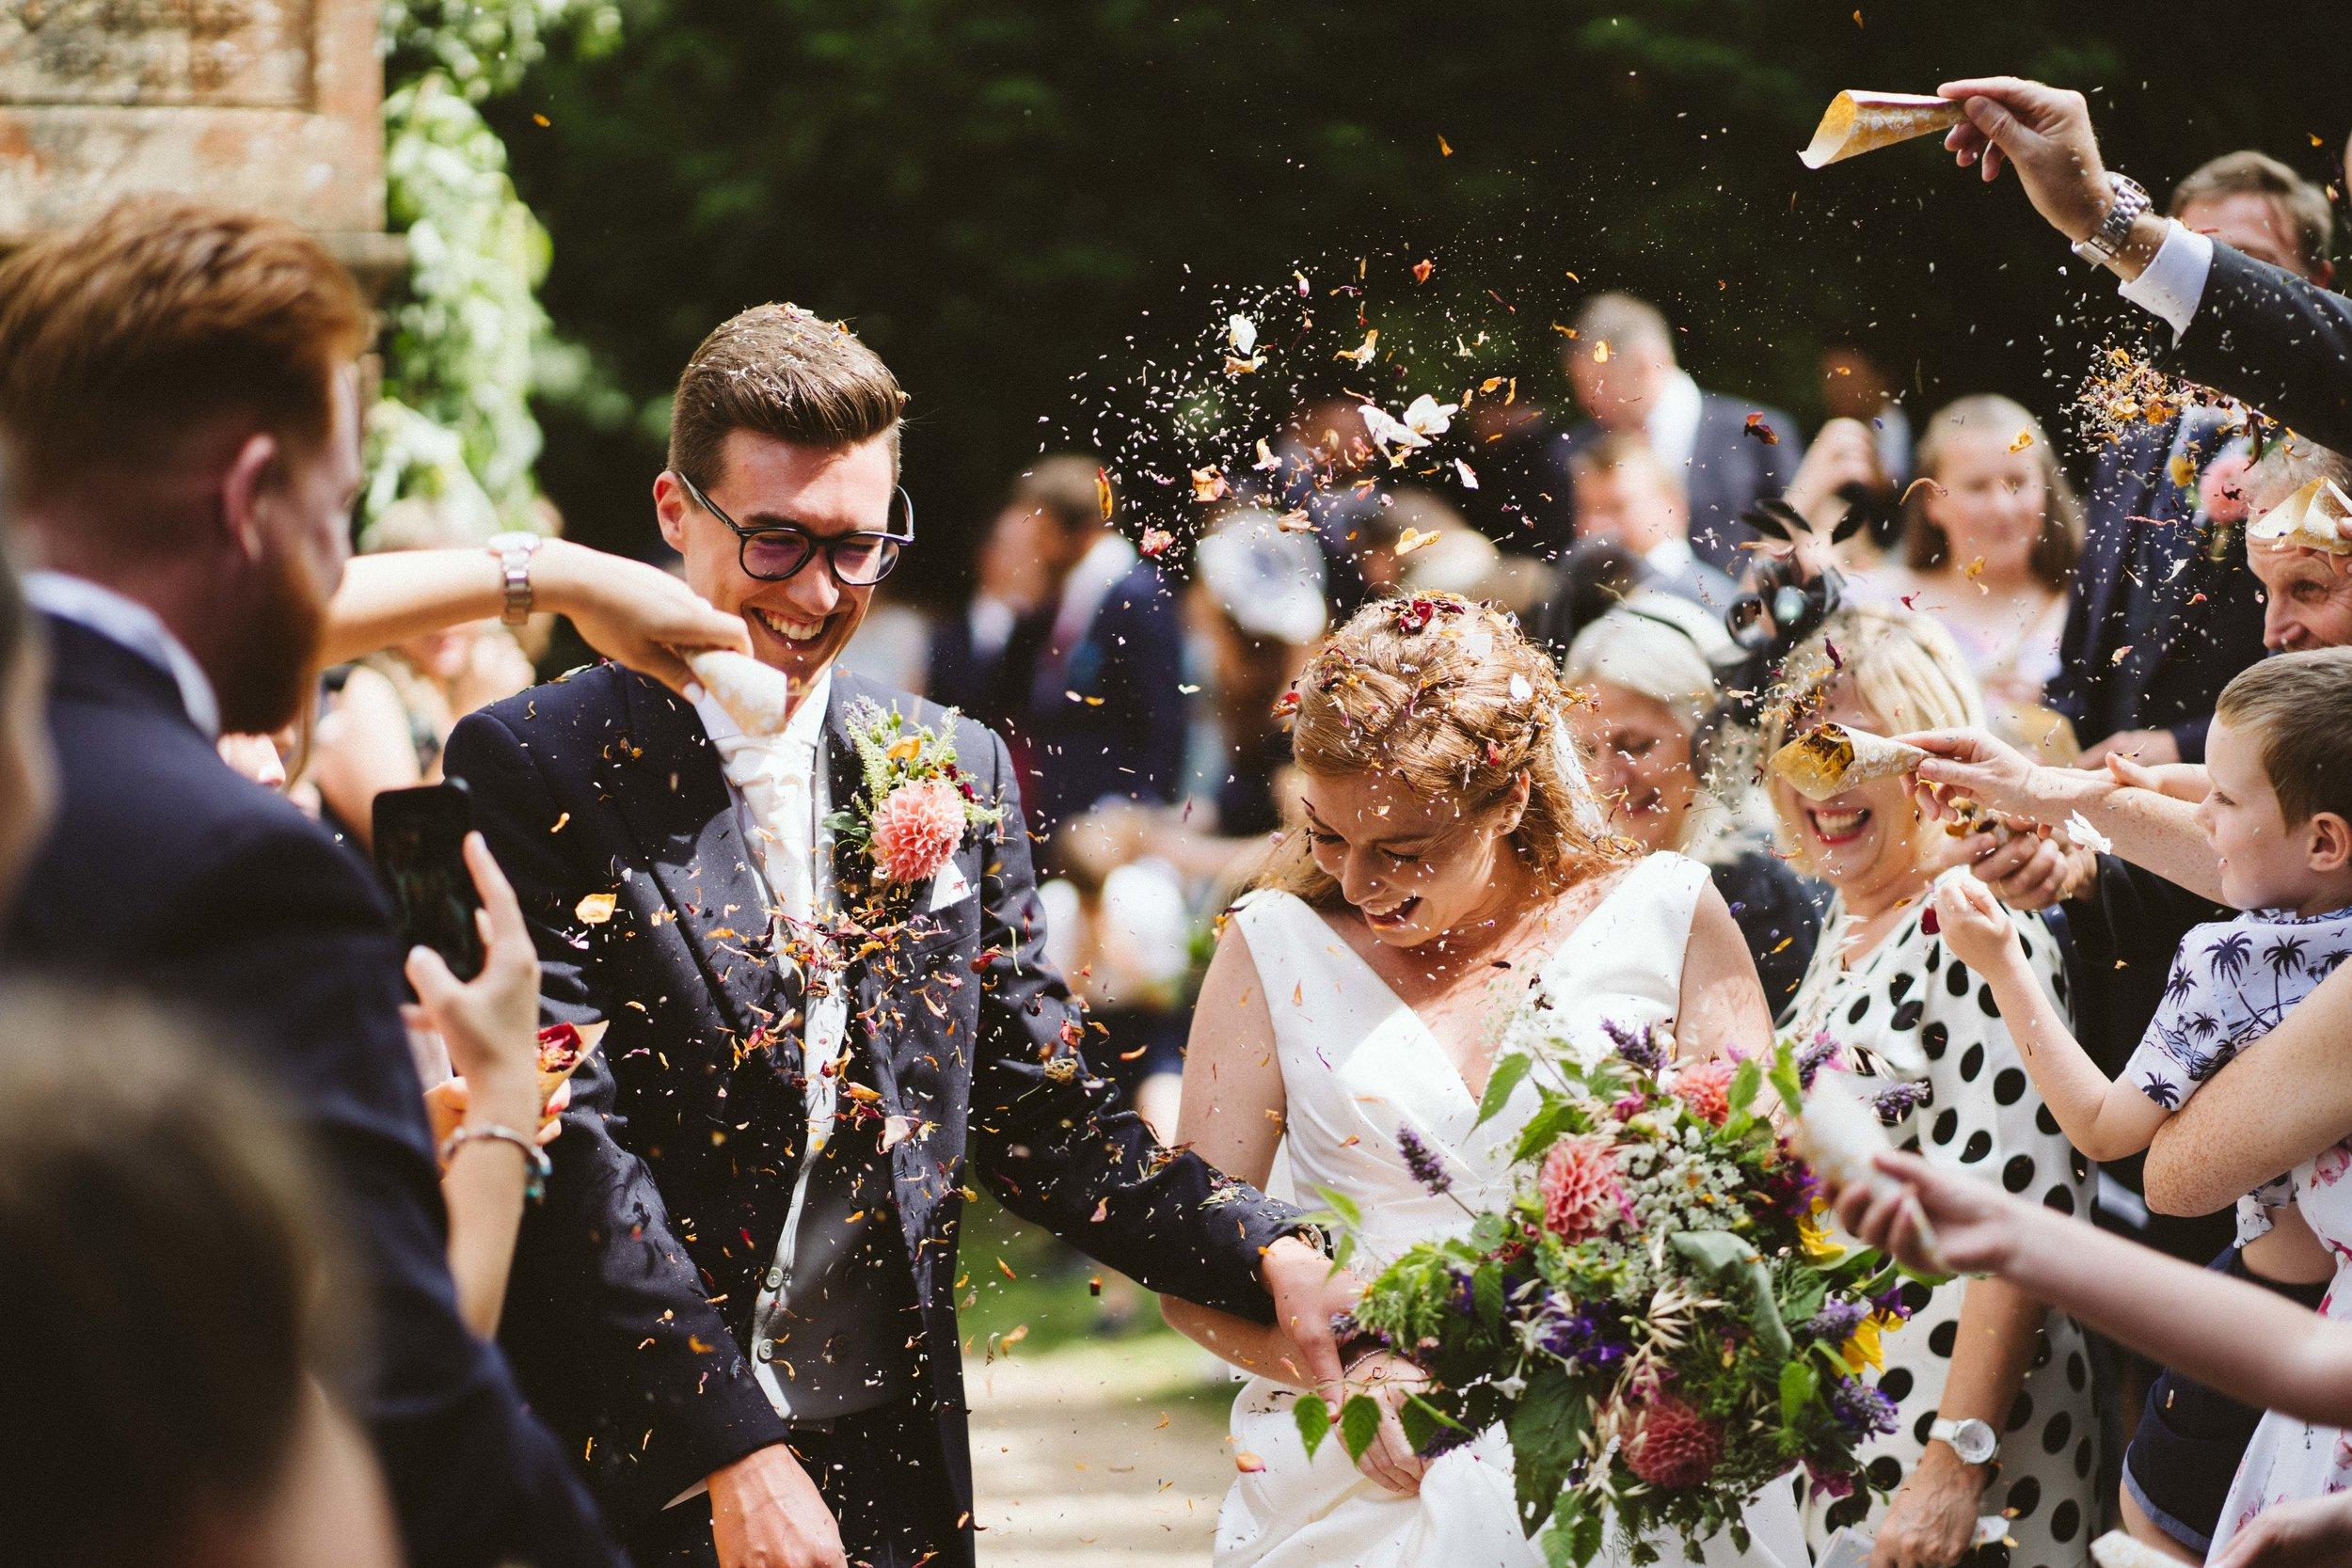 kent-wedding-photographer-209637.jpg